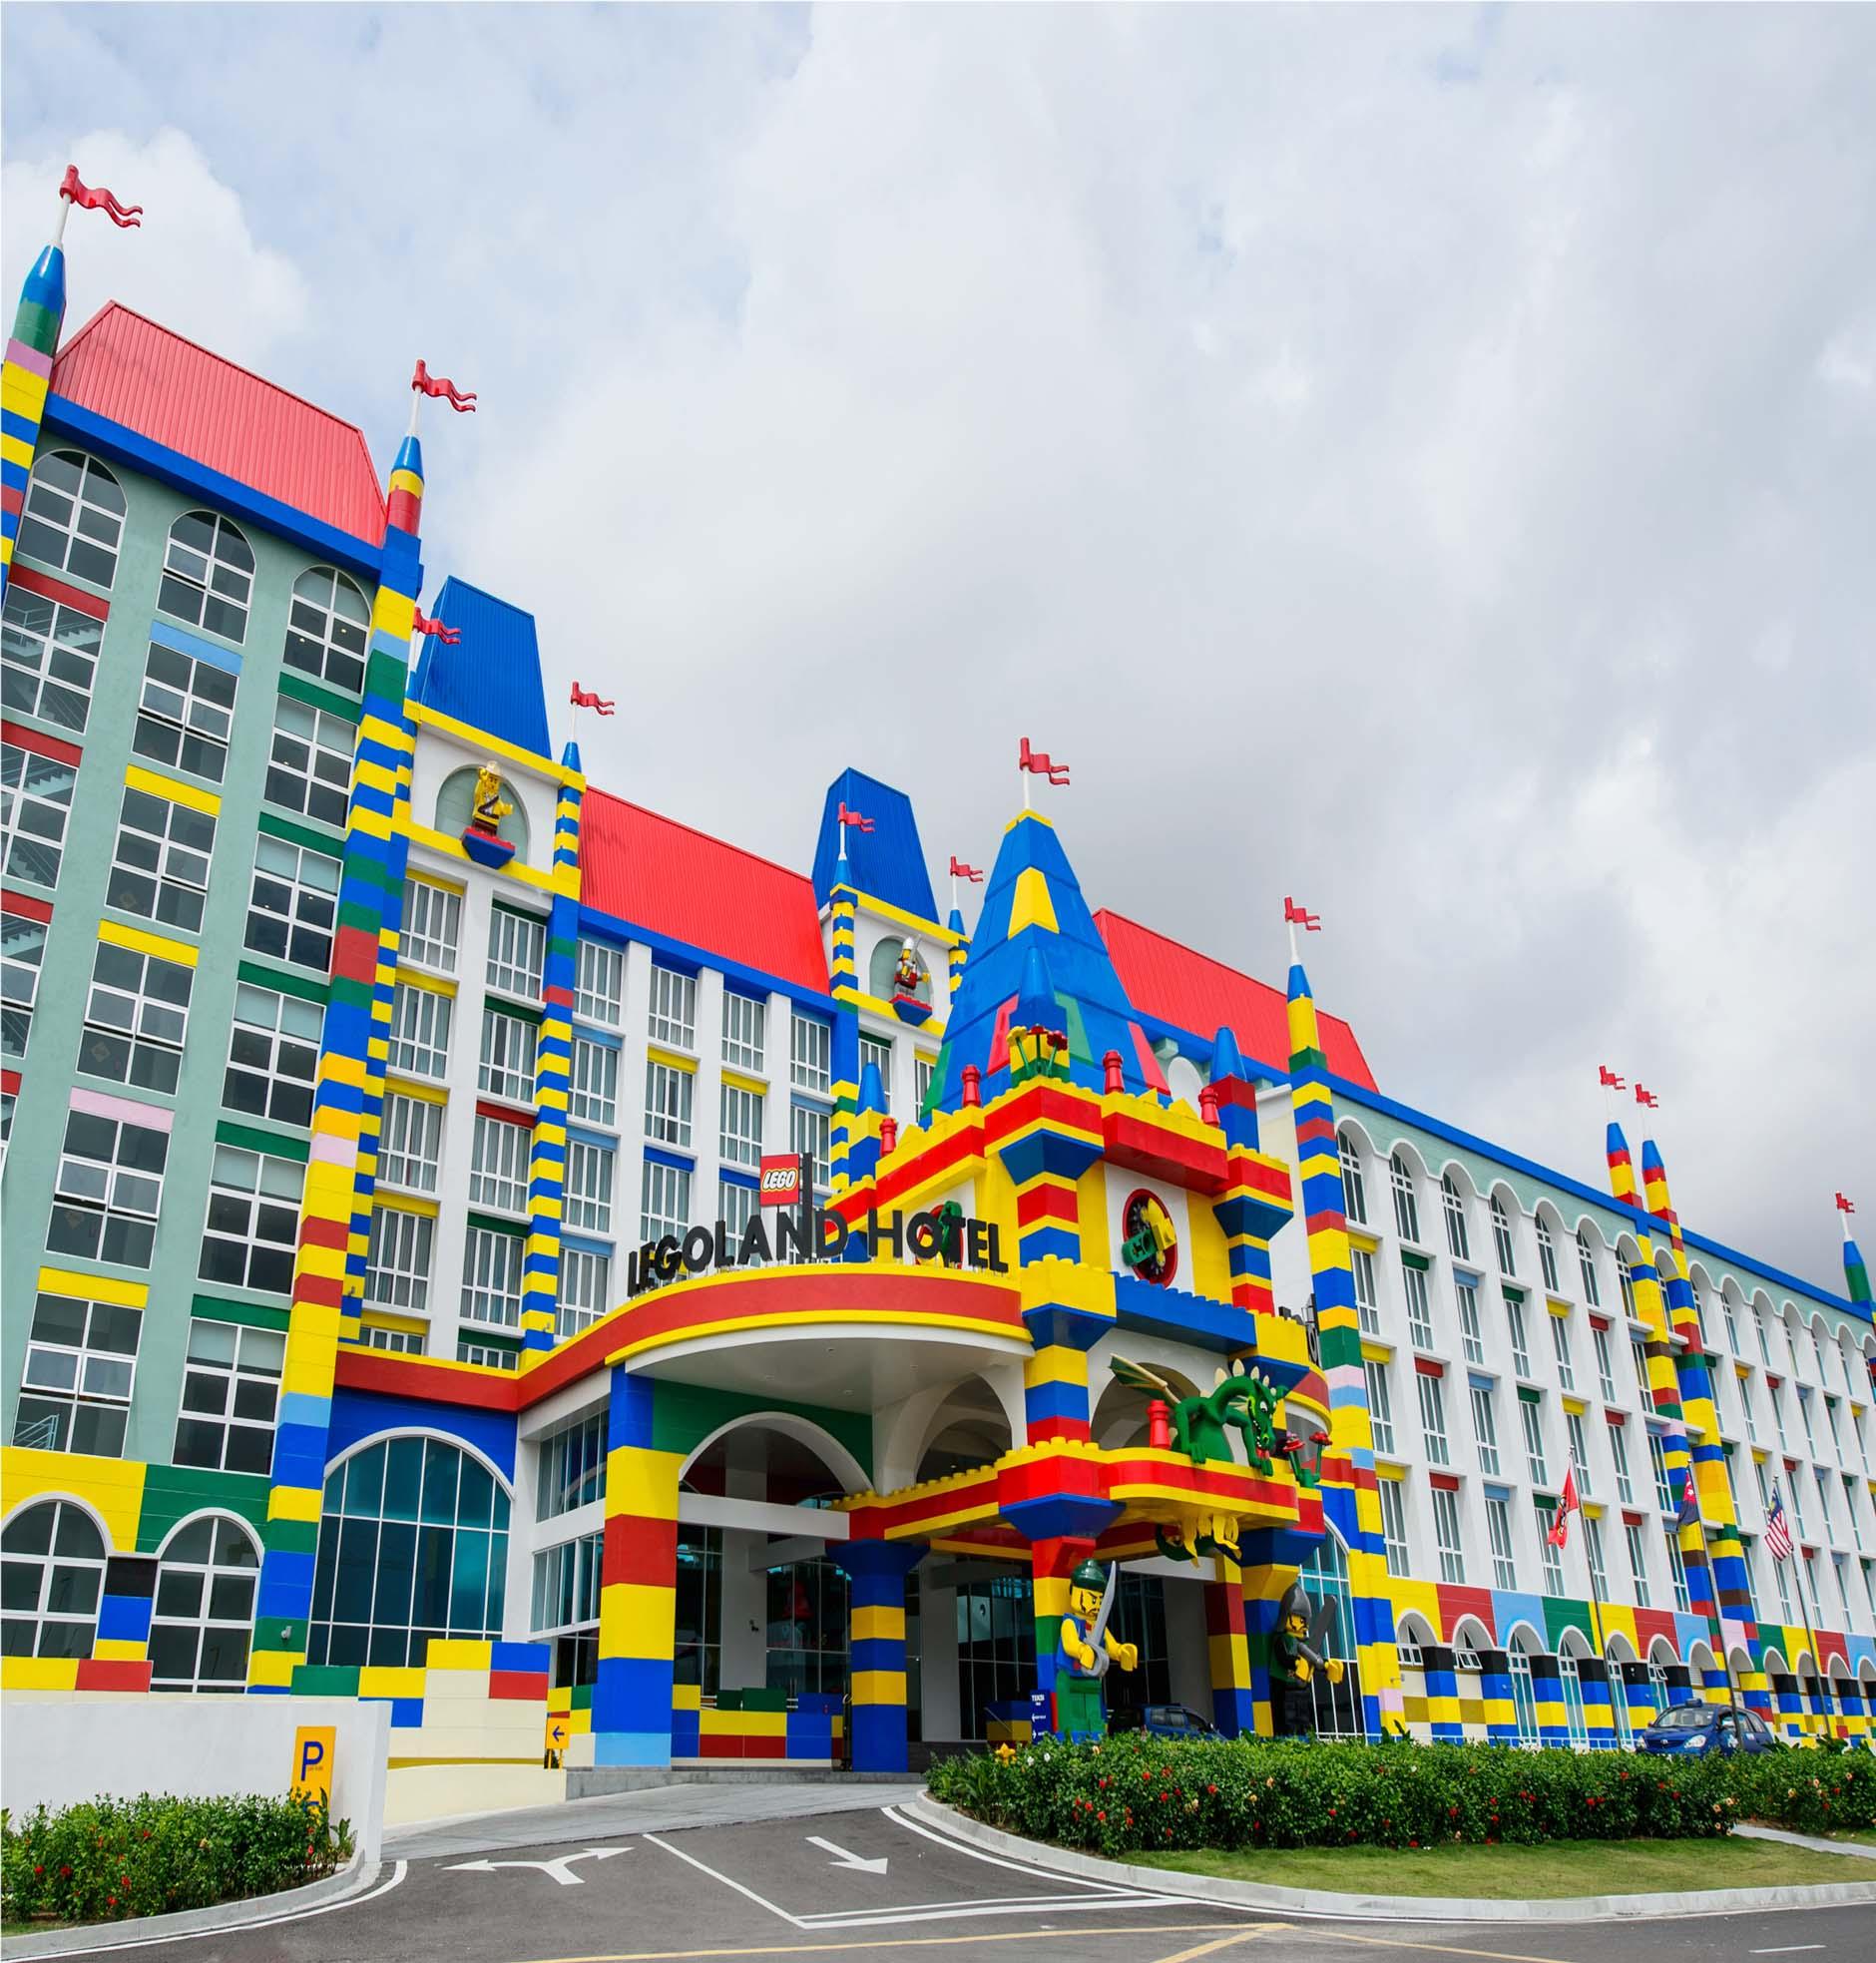 Legoland Hotel Nusajaya Johor Bahru